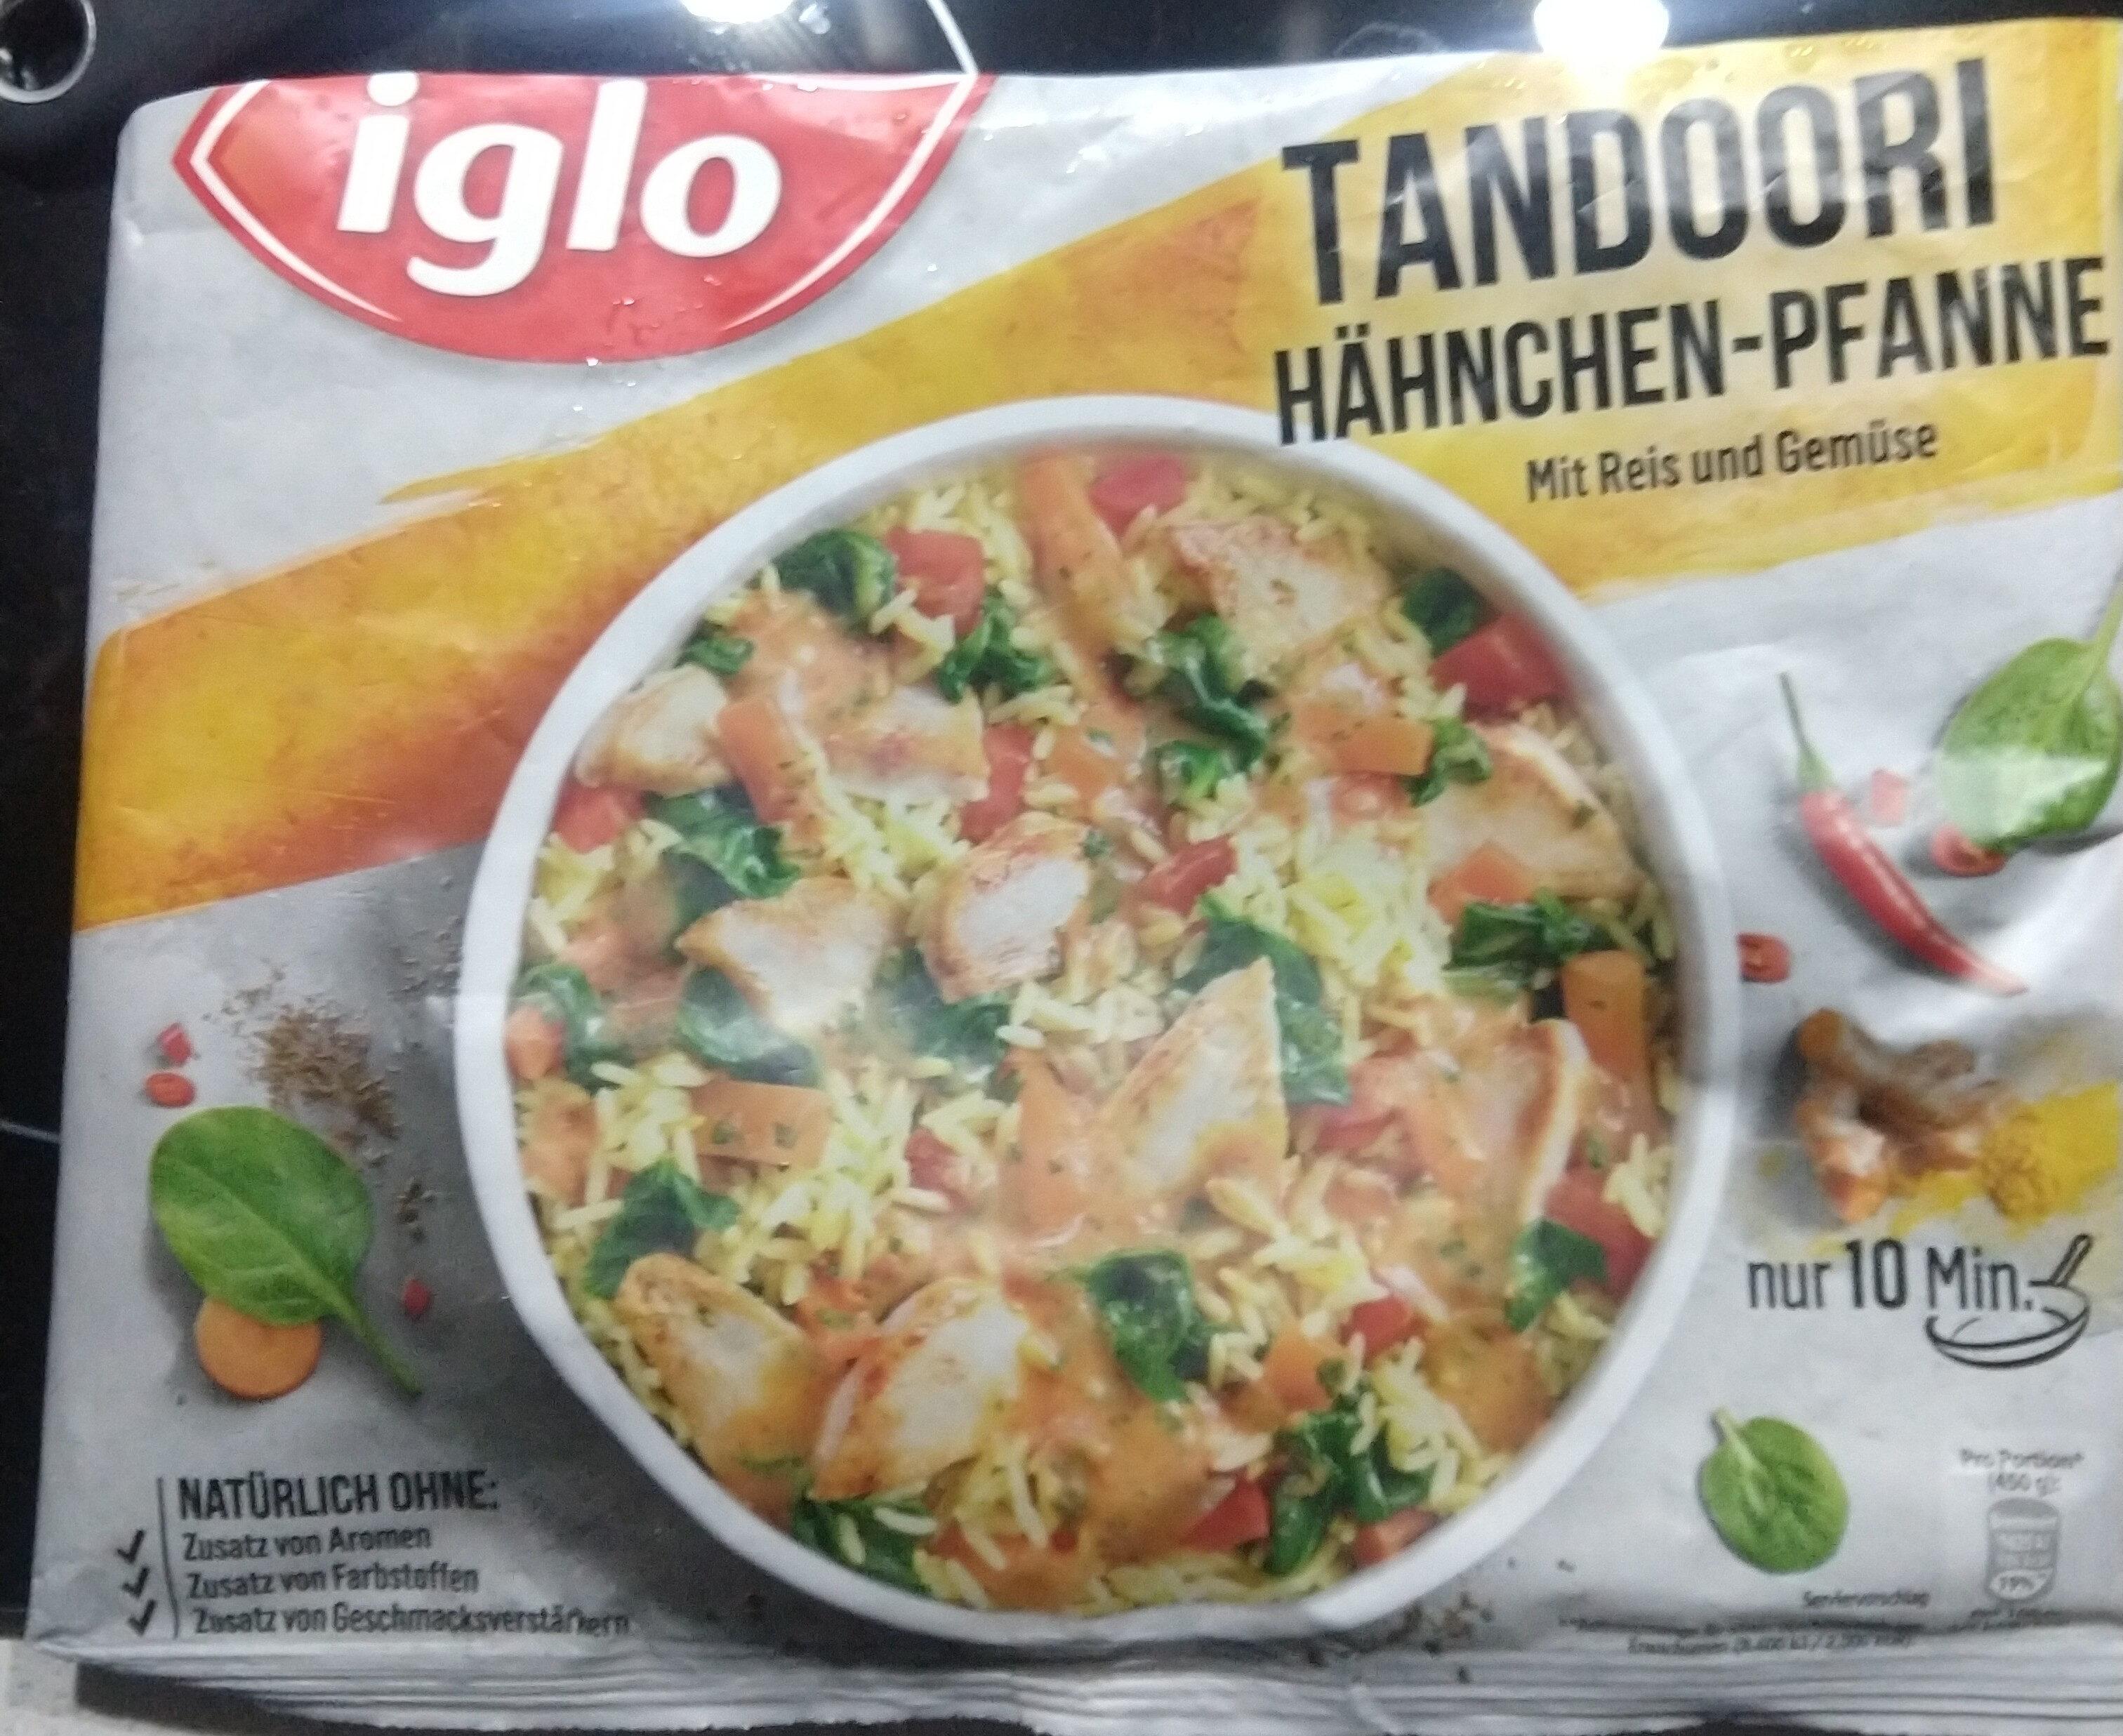 tandoori hähnchen pfanne - Product - de